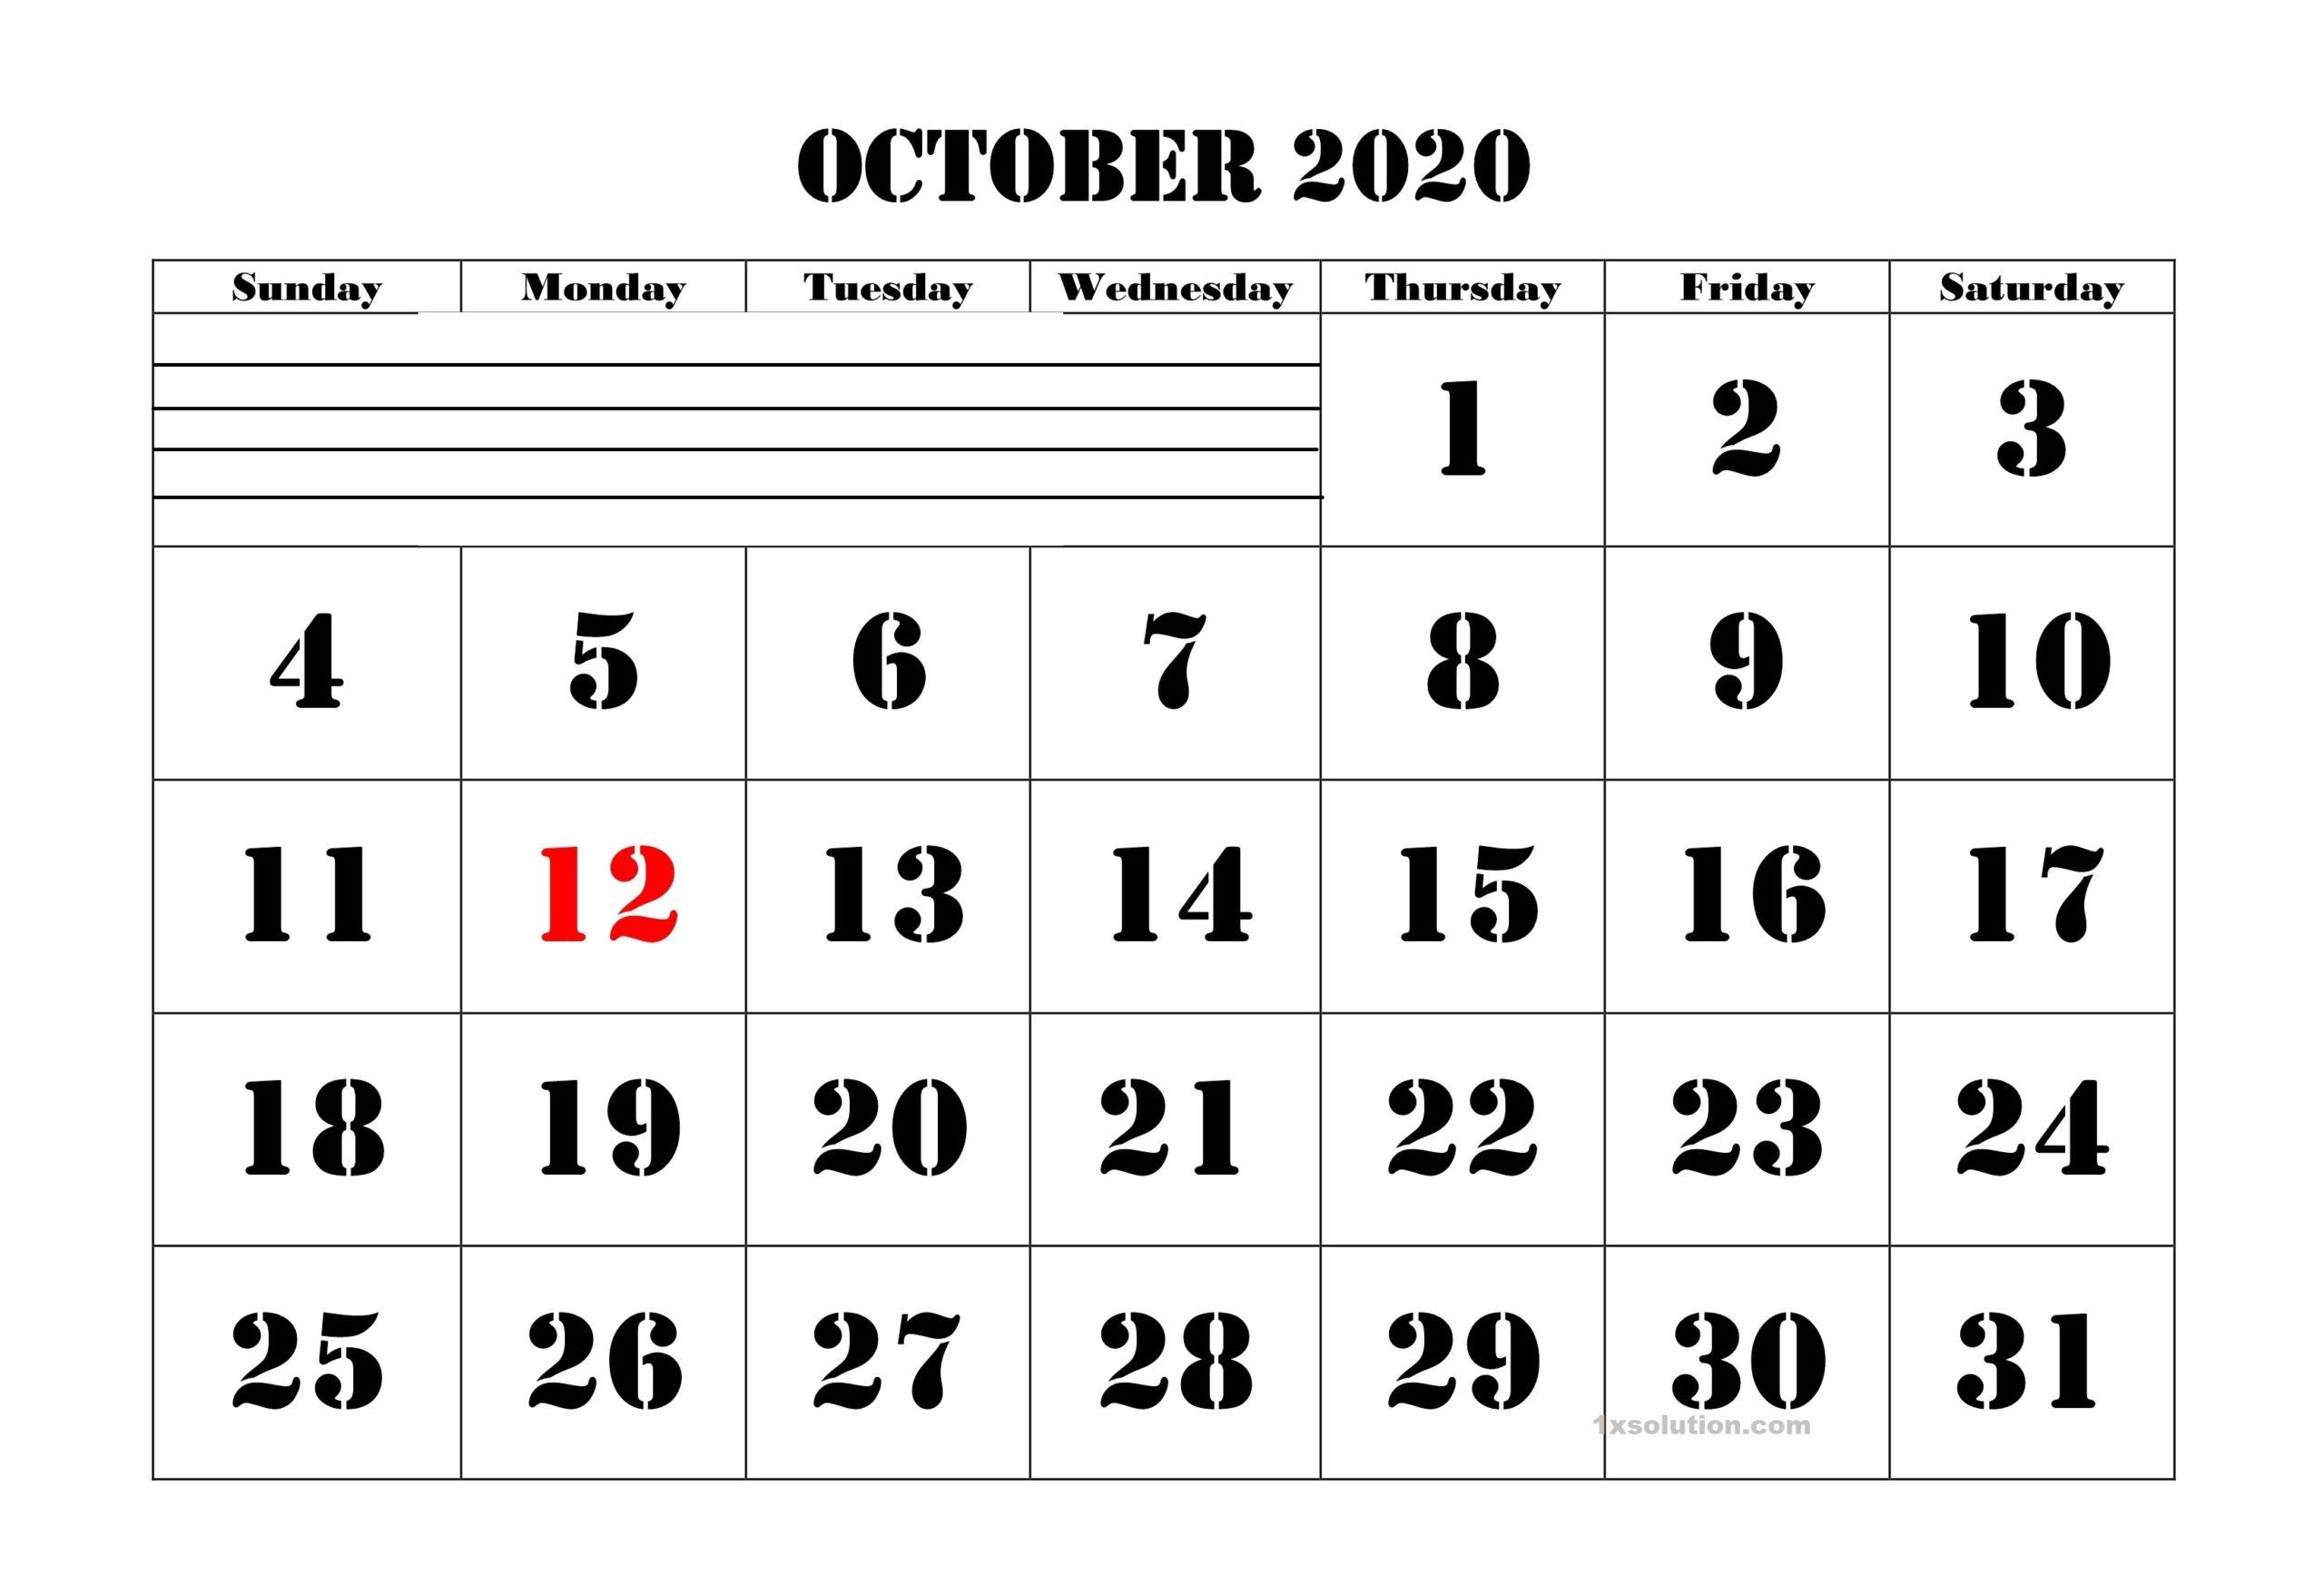 Blank October 2020 Calendar Sheet